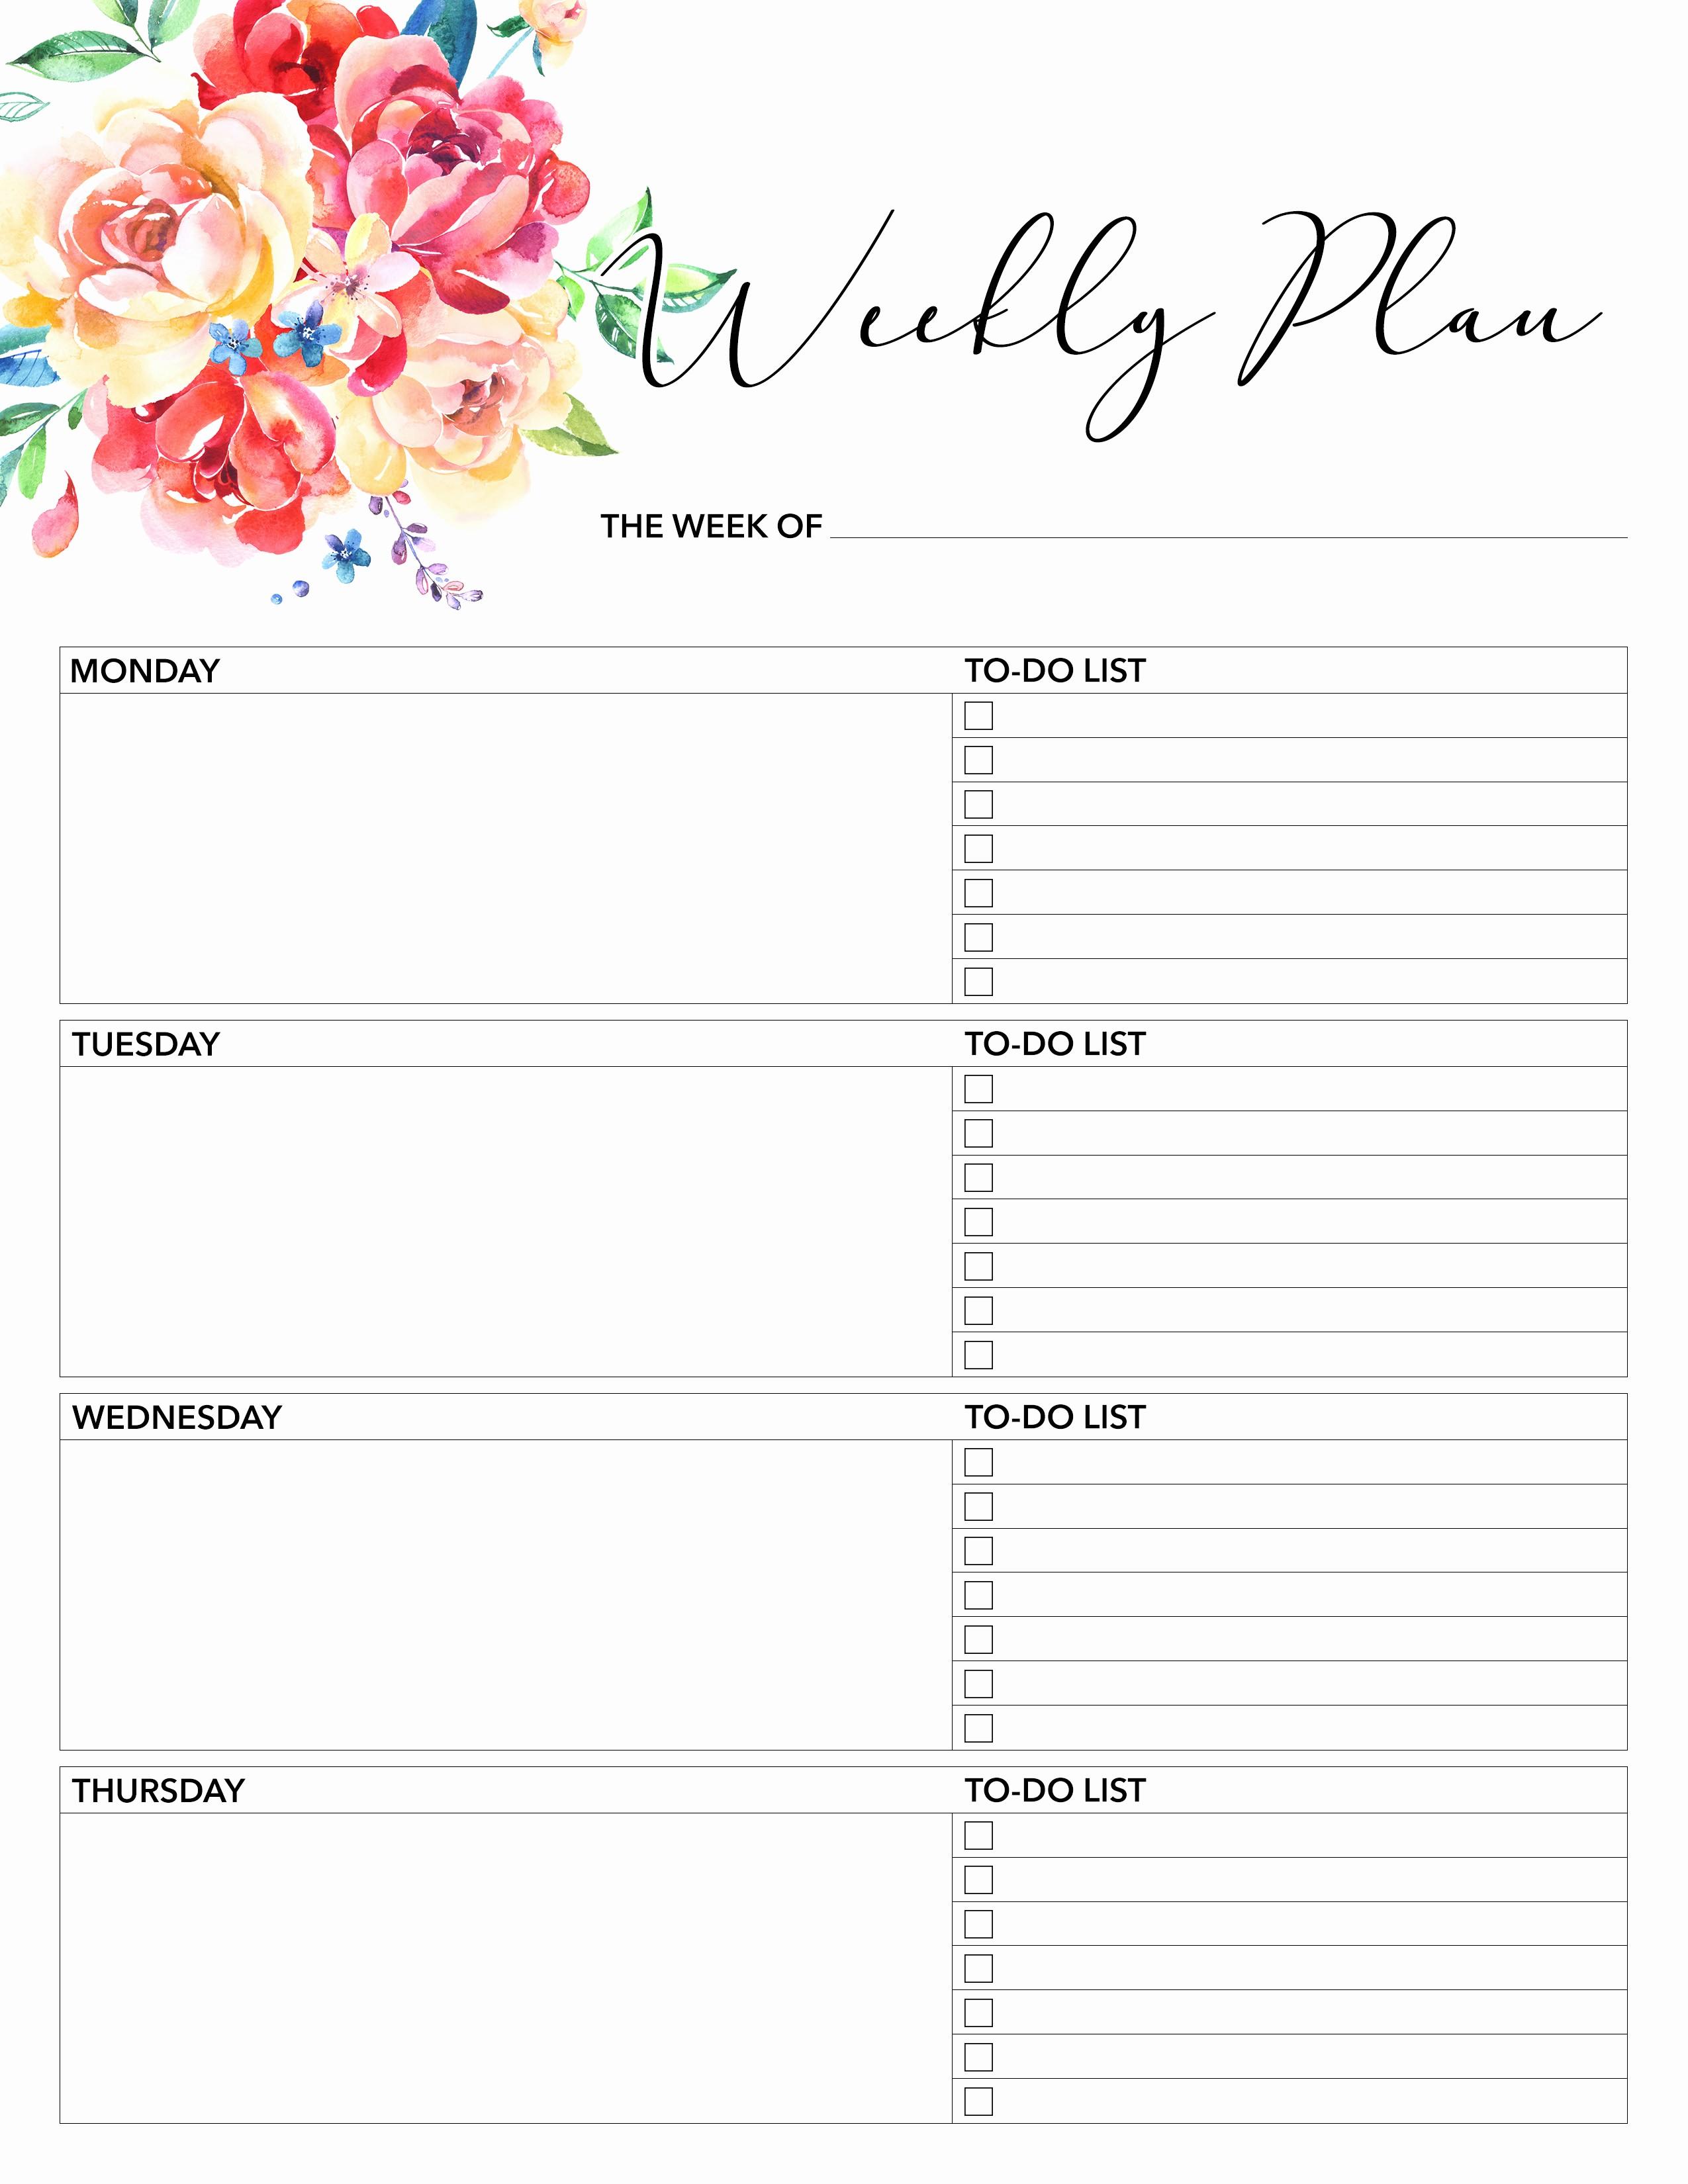 Free Printable Daily Calendar 2018 Elegant Free Printable 2018 Planner 50 Plus Printable Pages the